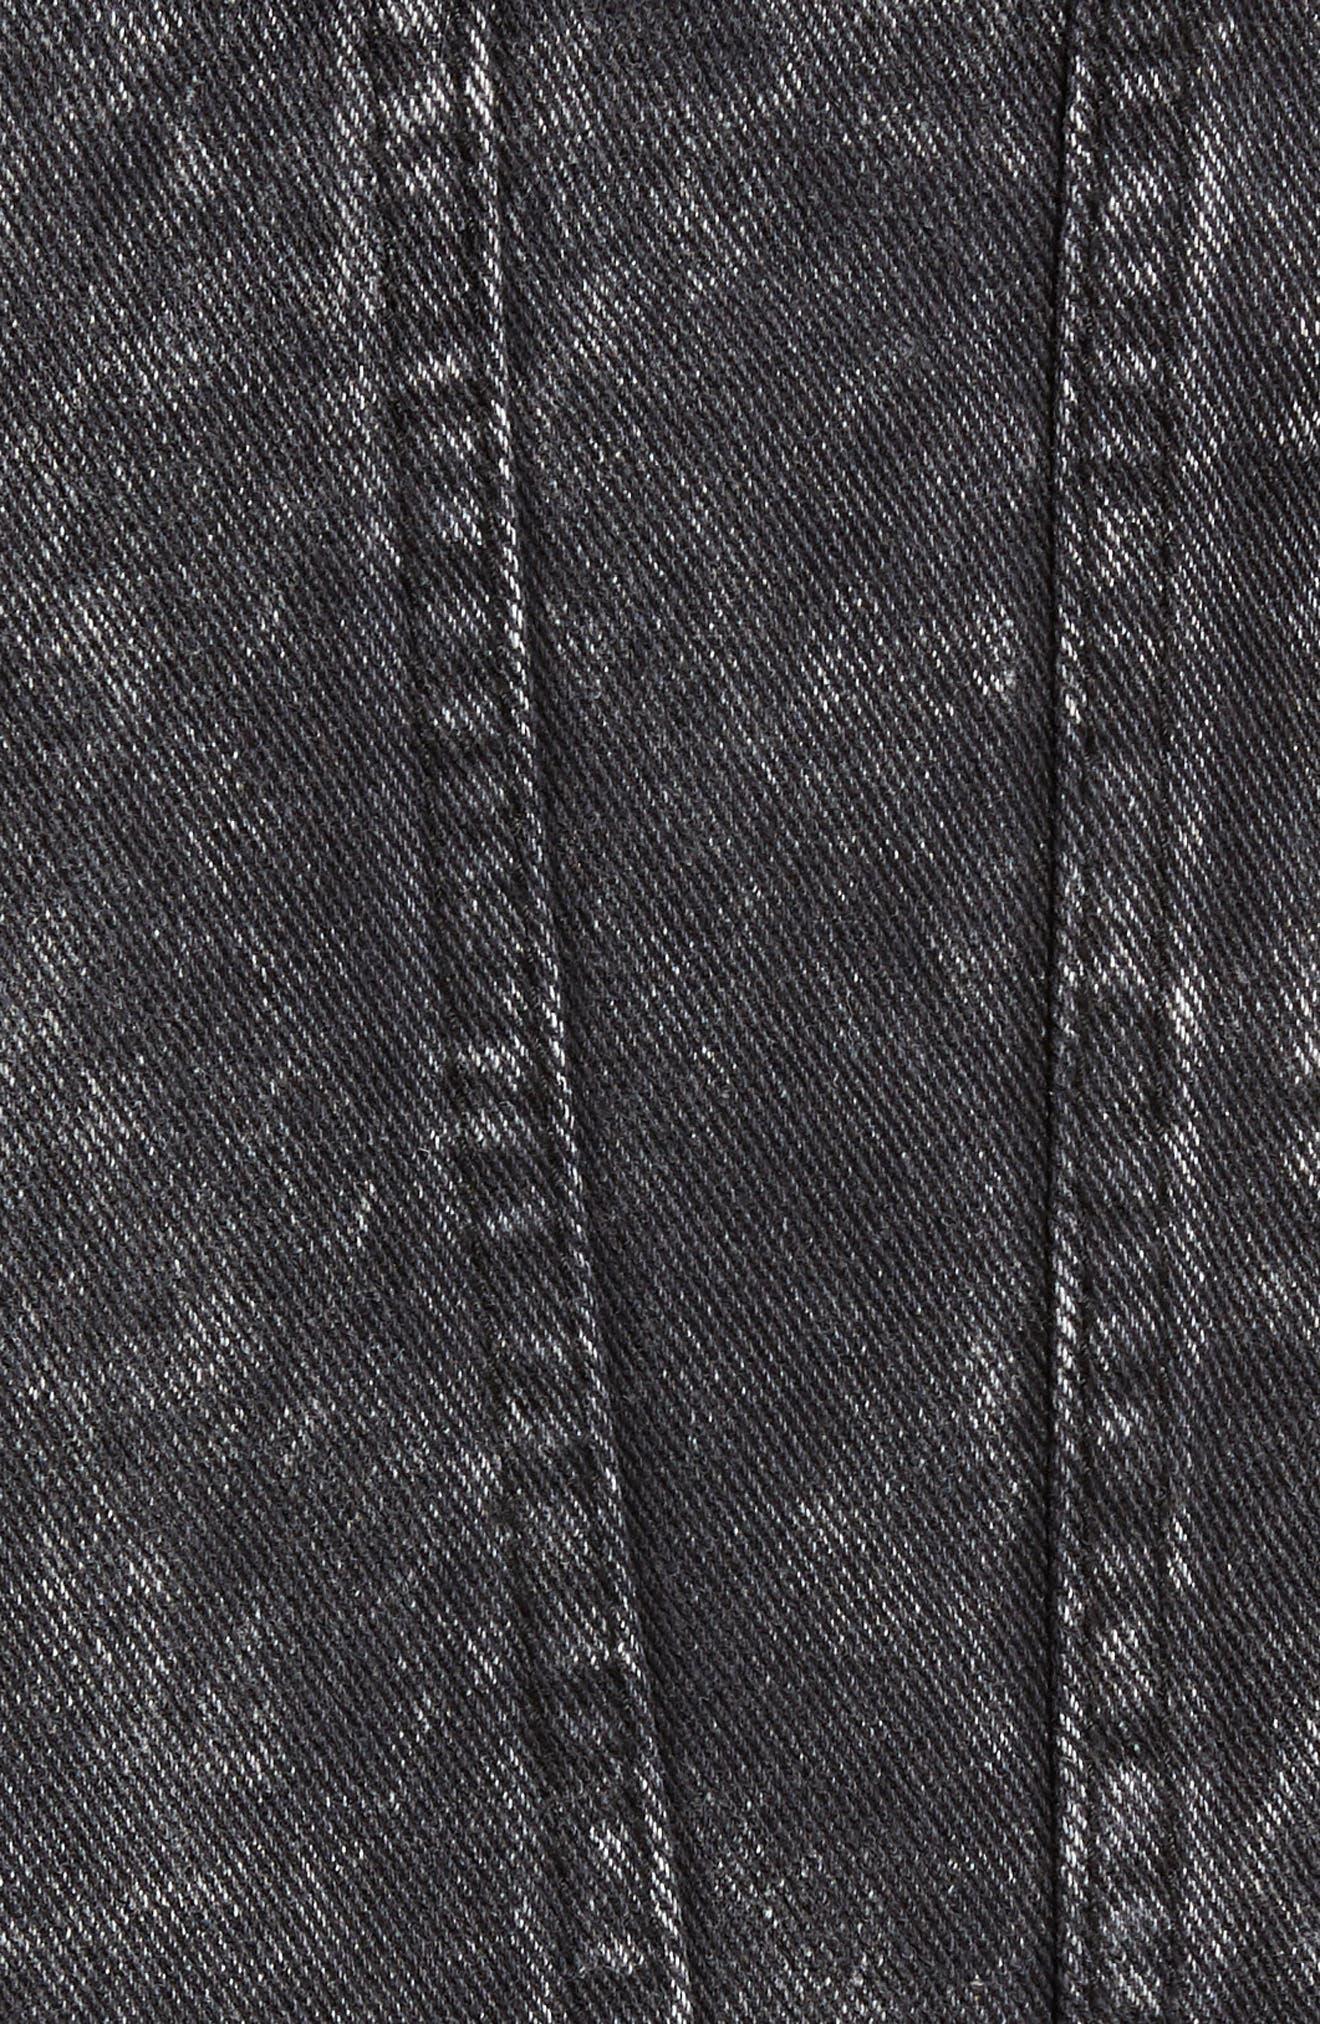 Billy Joel At the Garden Denim Jacket,                             Alternate thumbnail 5, color,                             Black Acid